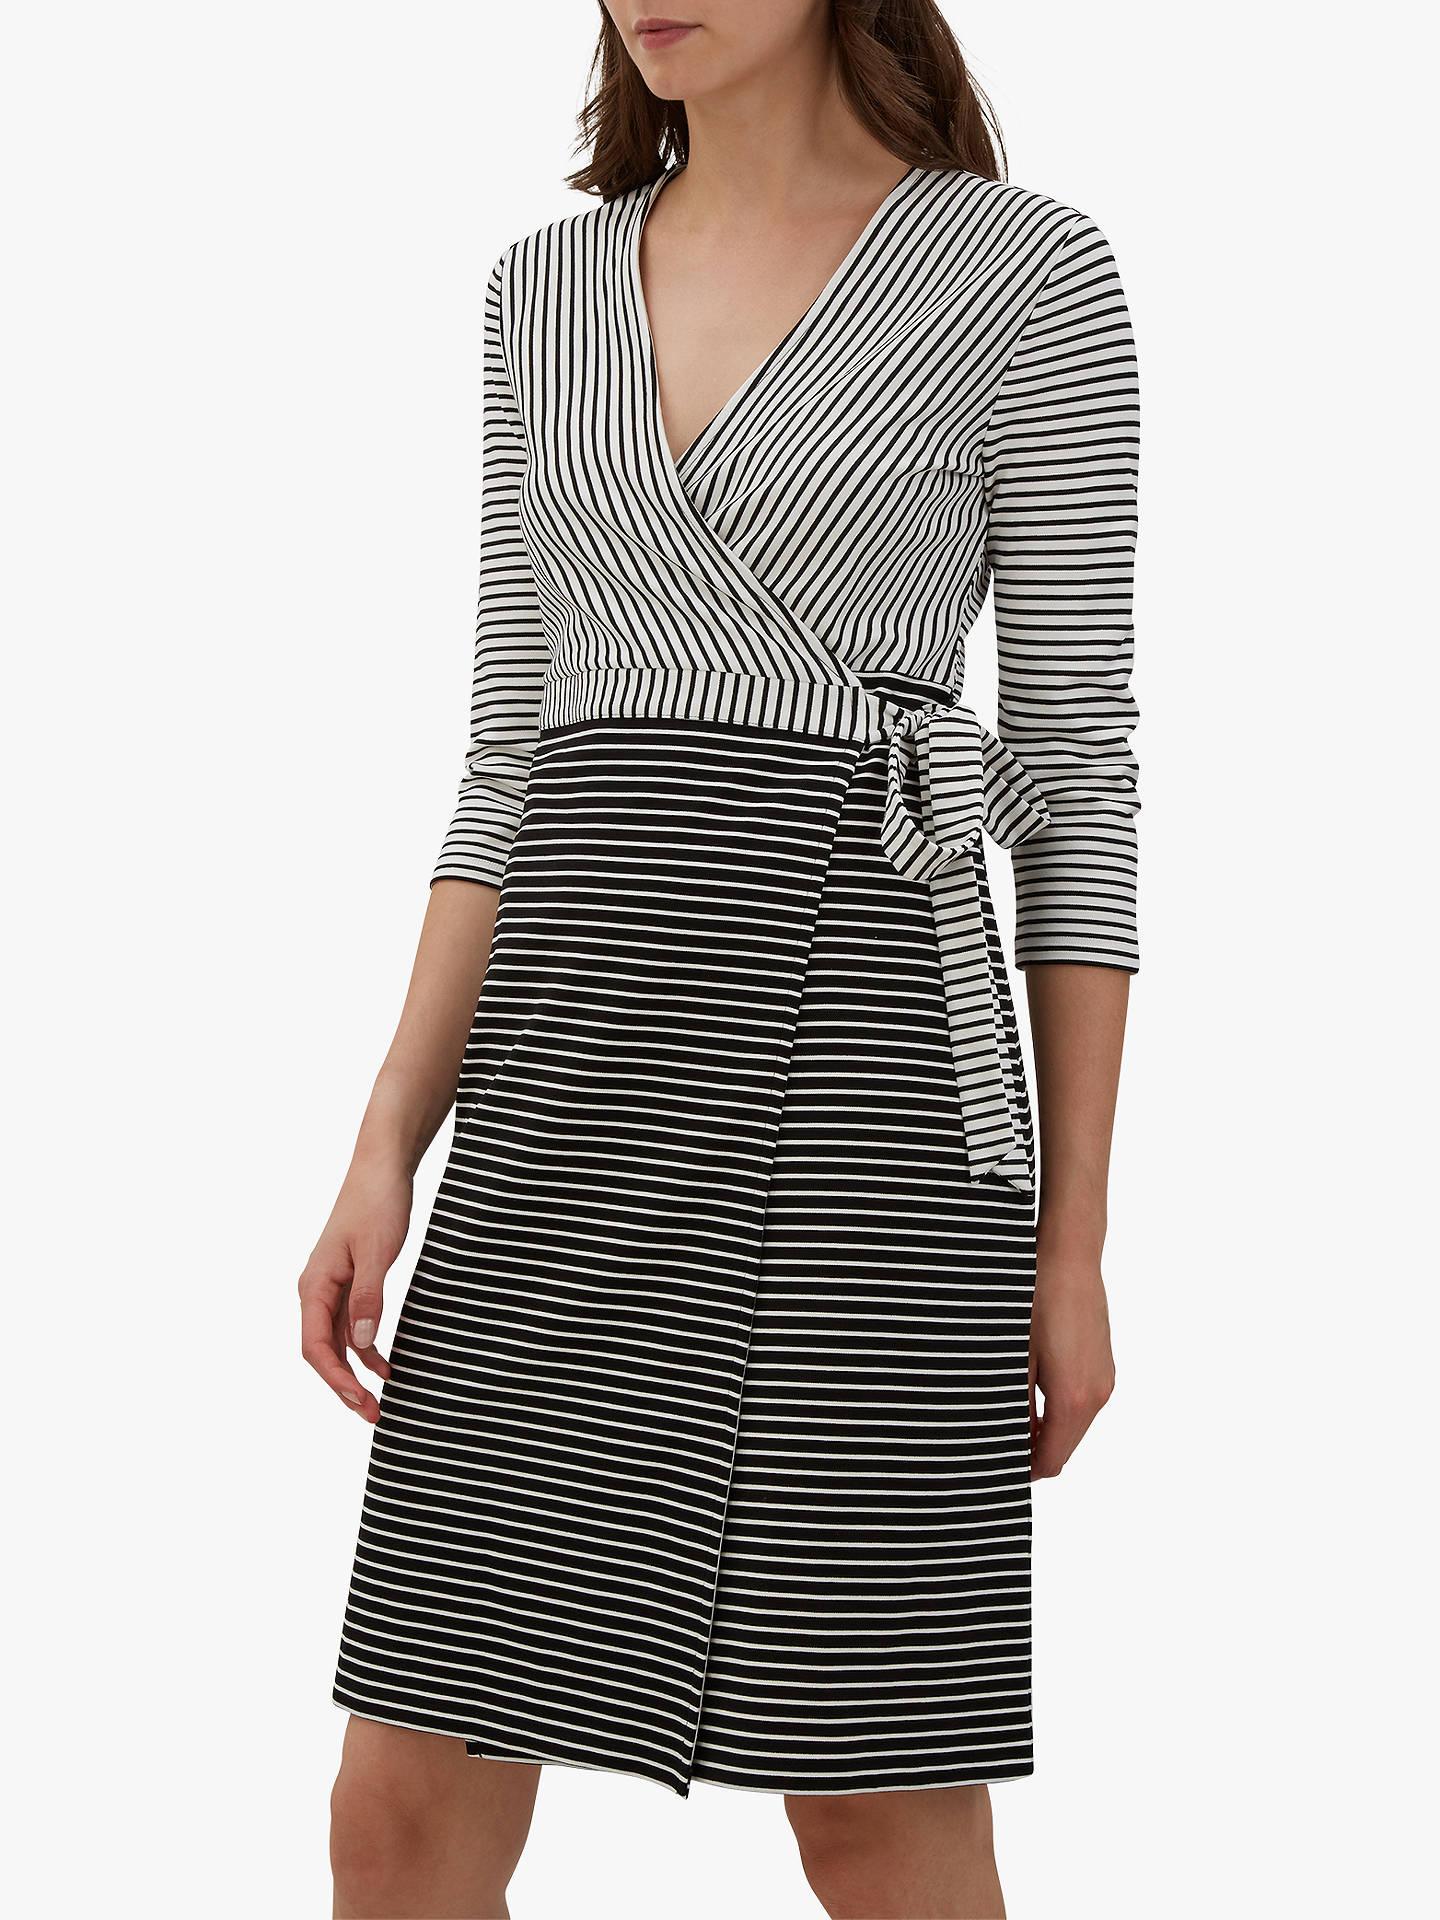 BuyJaeger Contrast Stripe Wrap Dress fd3bcc1f1